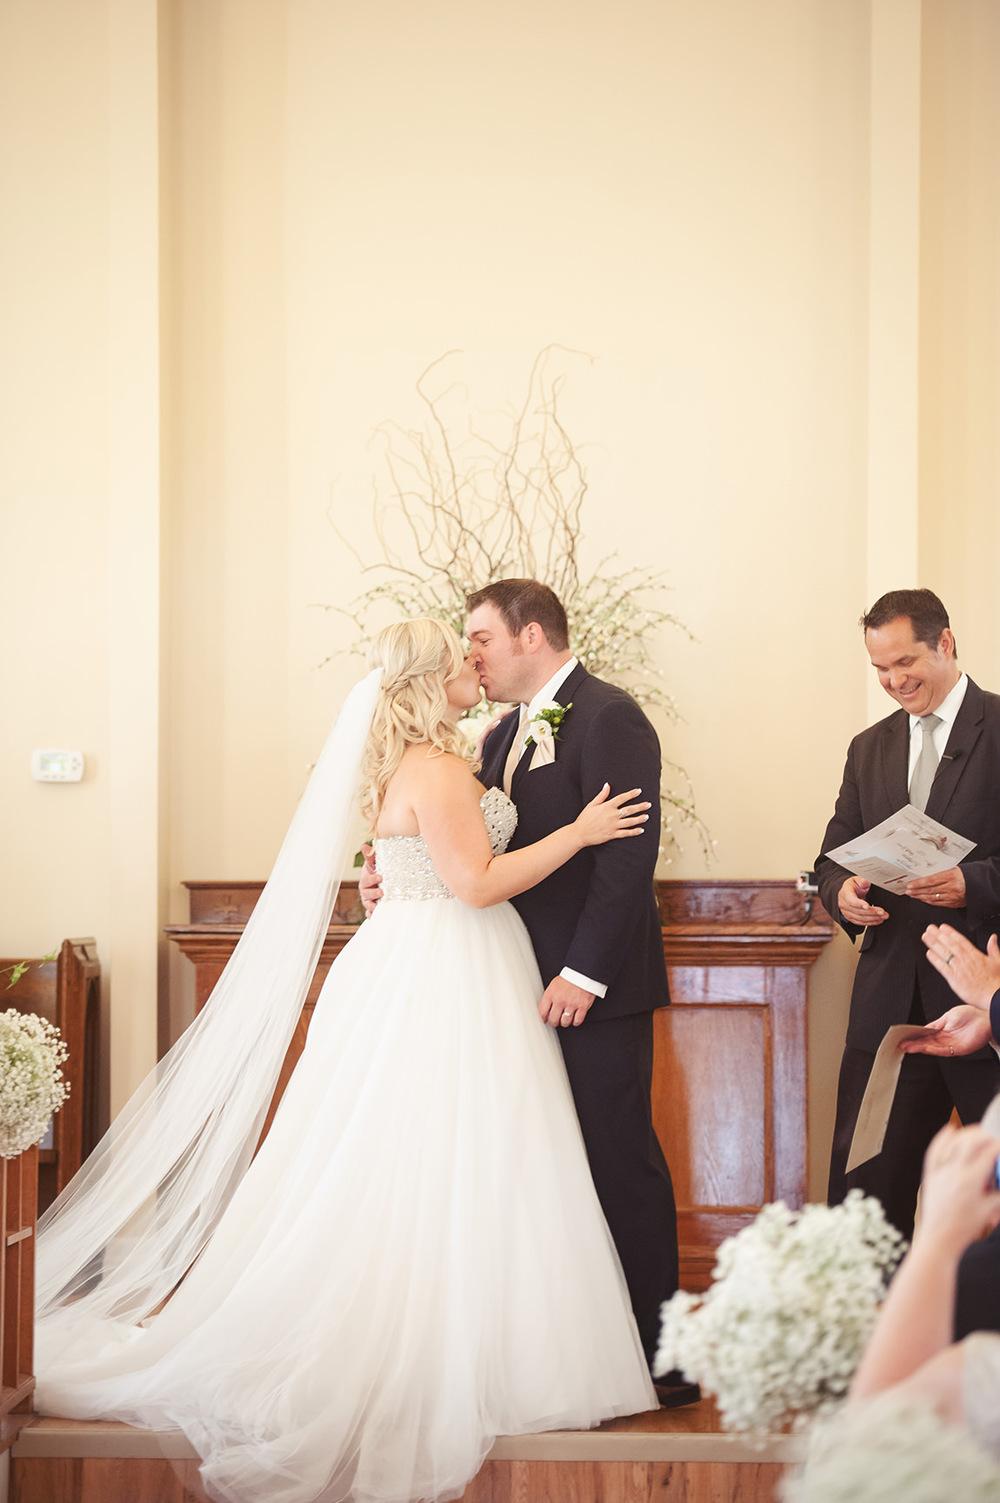 St-Catharines-Wedding-Stone-Mill-Inn-Amy-Darryl-photography-by-Morgan-Falk-029.JPG